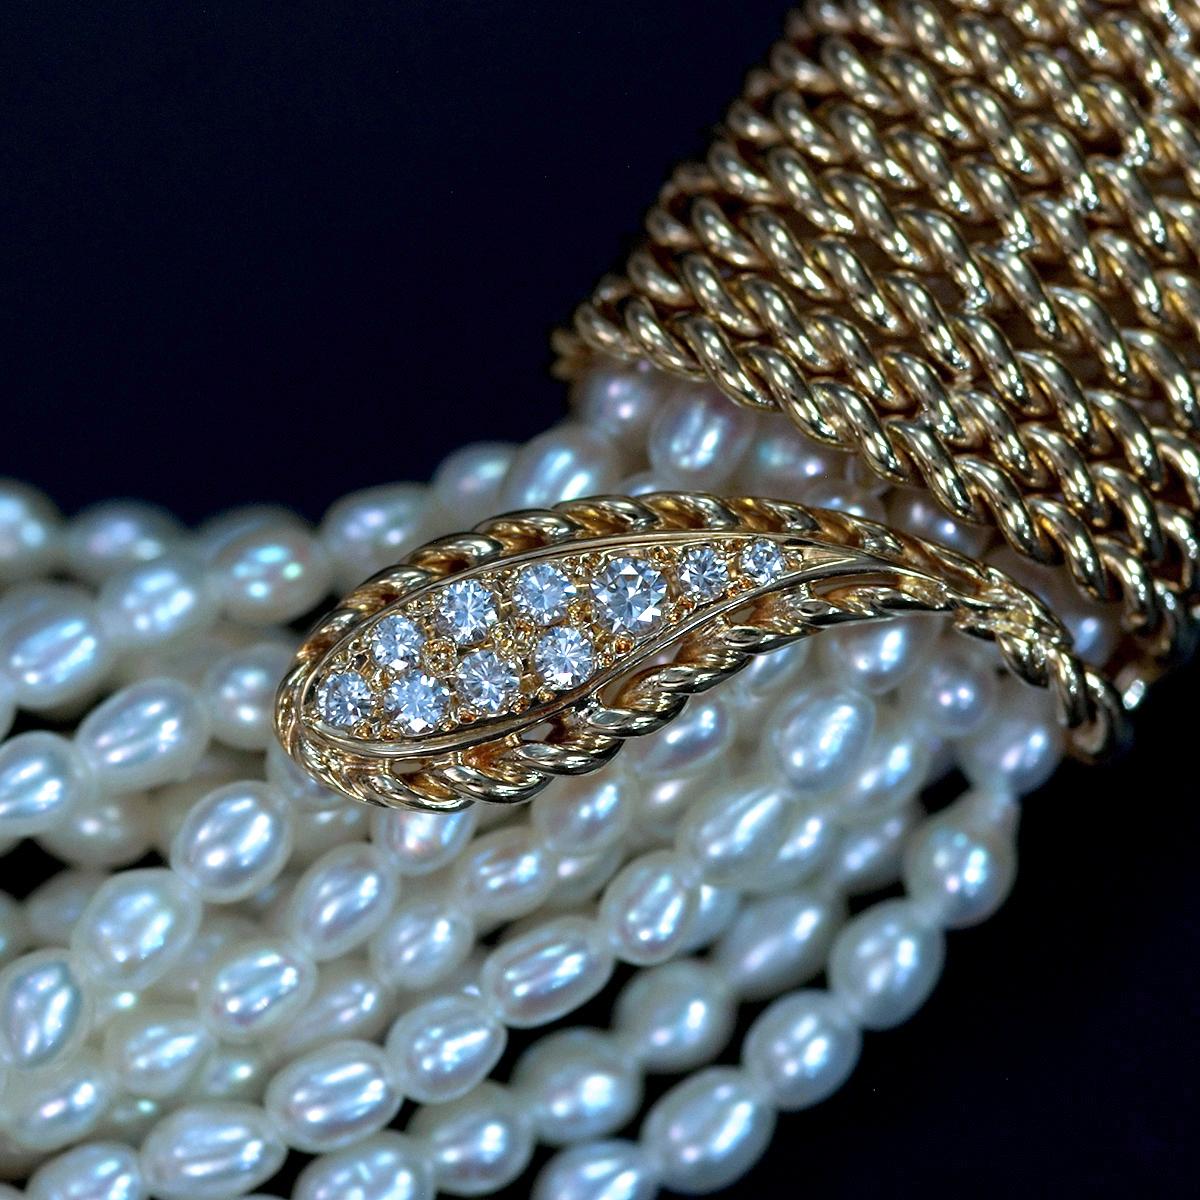 F0211【MIKIMOTO 1899】ミキモト パール 天然絶品ダイヤモンド0.33ct 最高級18金/14金無垢ネックレス 長さ42cm 重量87.5g 縦幅18.6mm_画像2